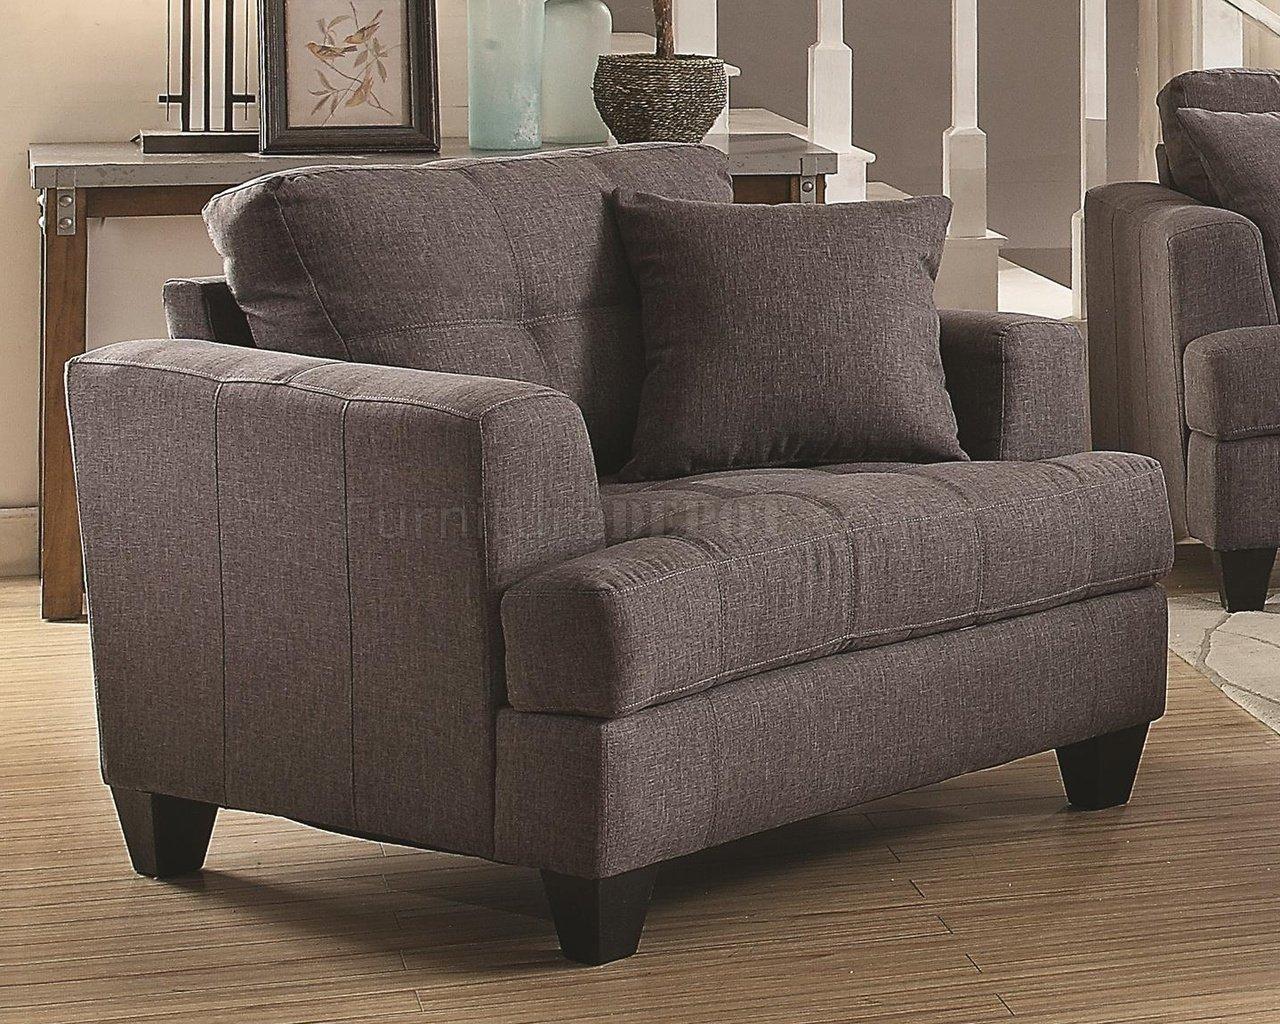 coaster samuel bonded leather sofa sleek sets for small flats in mumbai contemporary